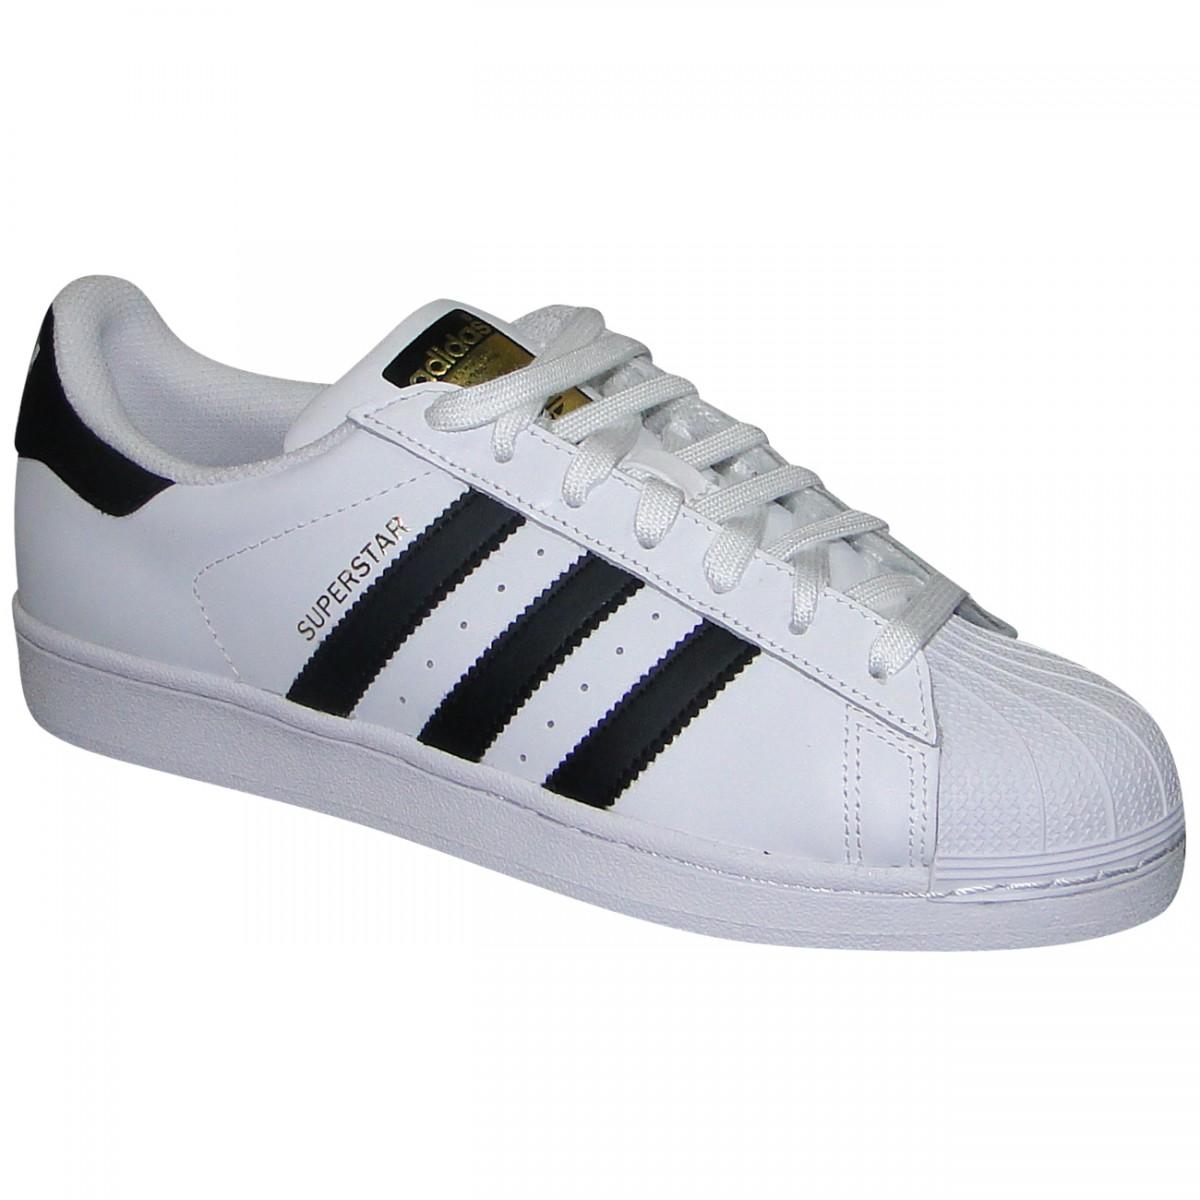 australia adidas superstar branco e preto feminino cb24f f2f73 c496448fe9b65